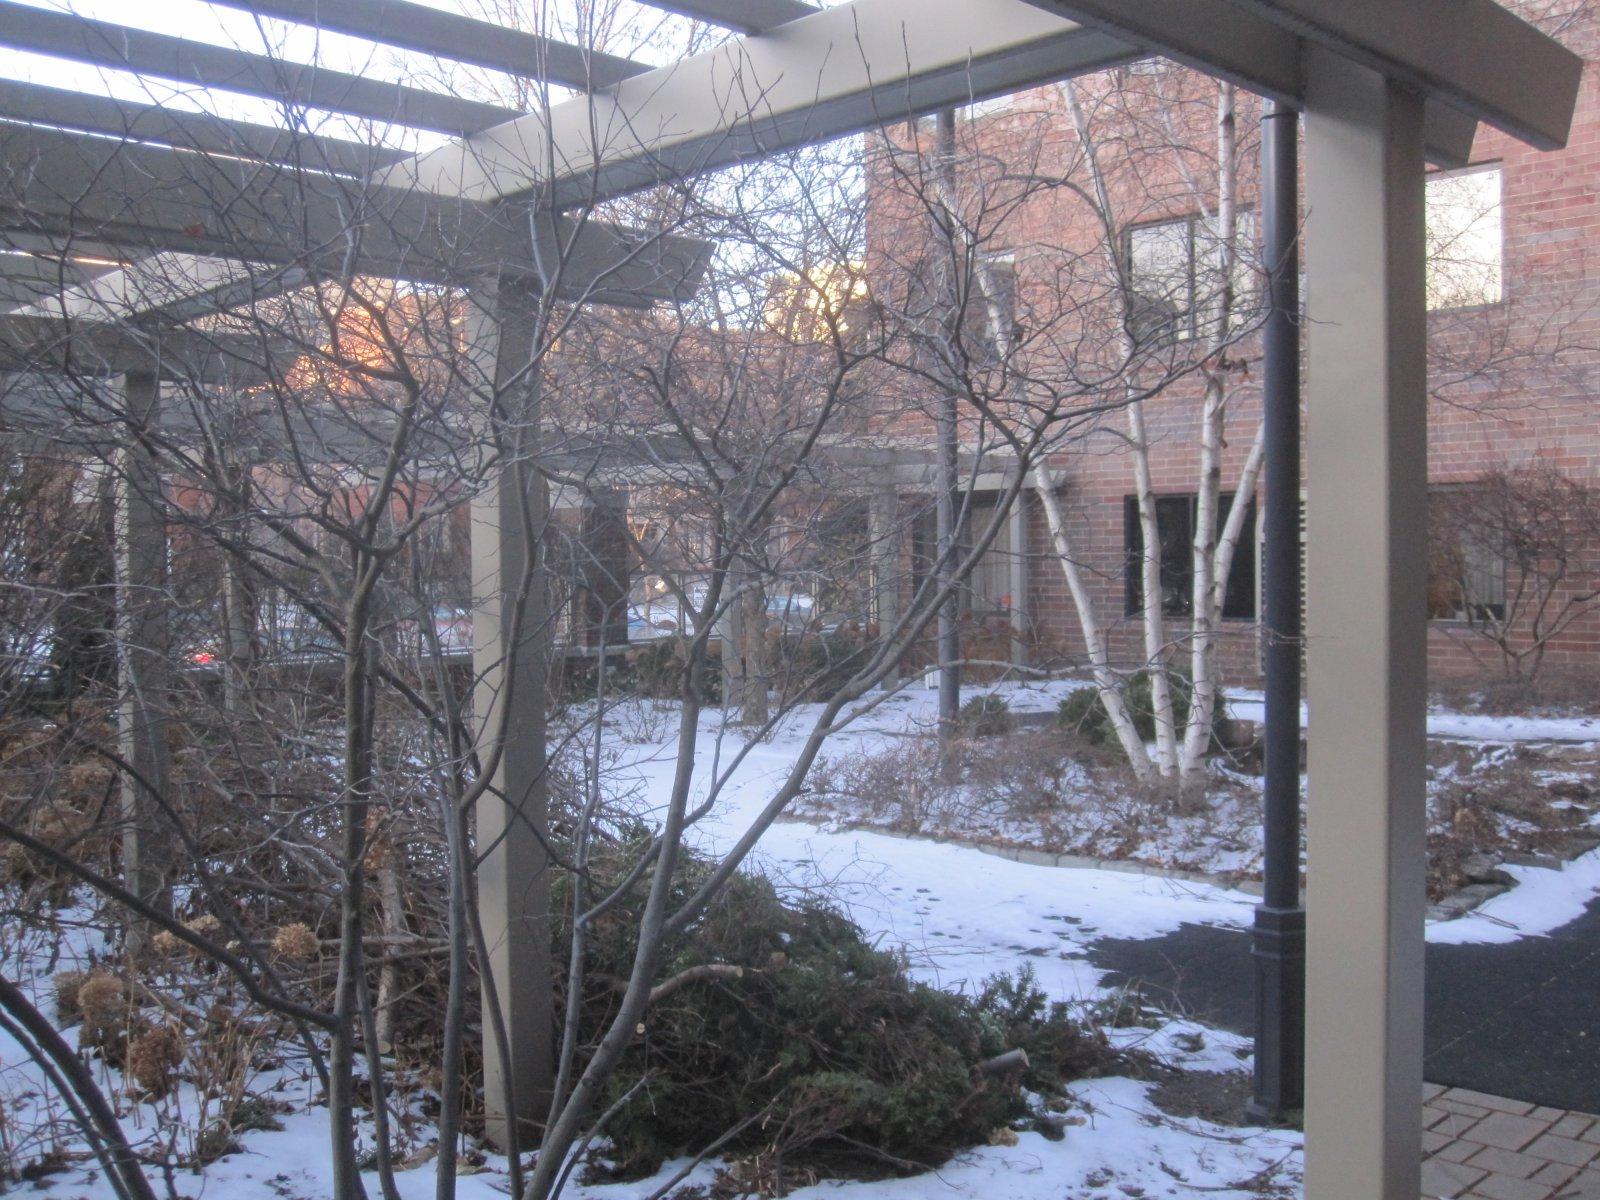 Walled garden area